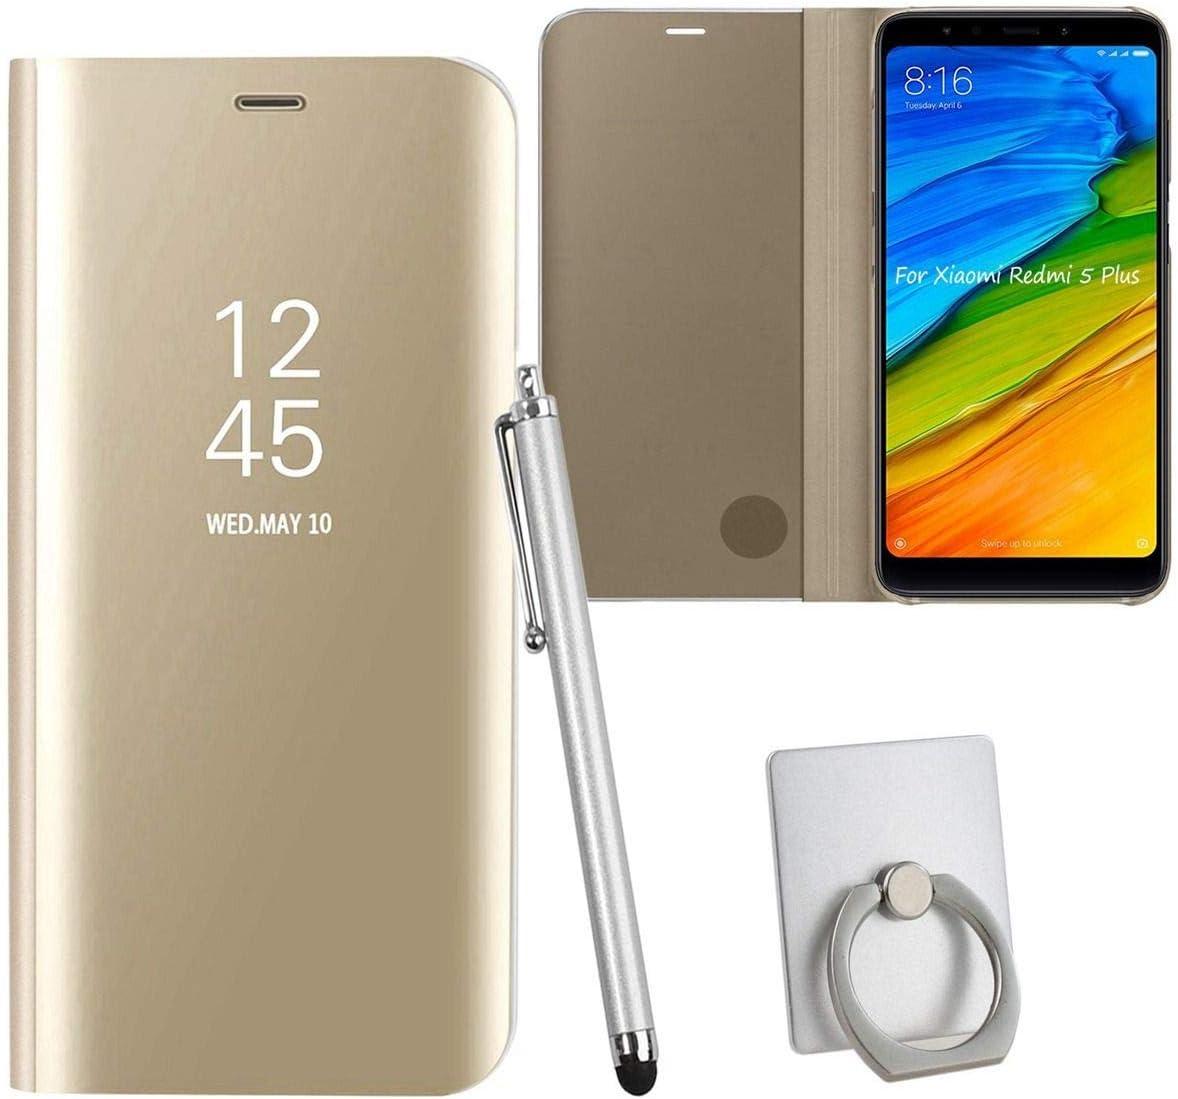 Sangrl Funda para Xiaomi Redmi 5 Plus, Ultra Delgada Shock Caja Espejo Espejo Translúcido Case Funda para Xiaomi Redmi 5 Plus - Gold